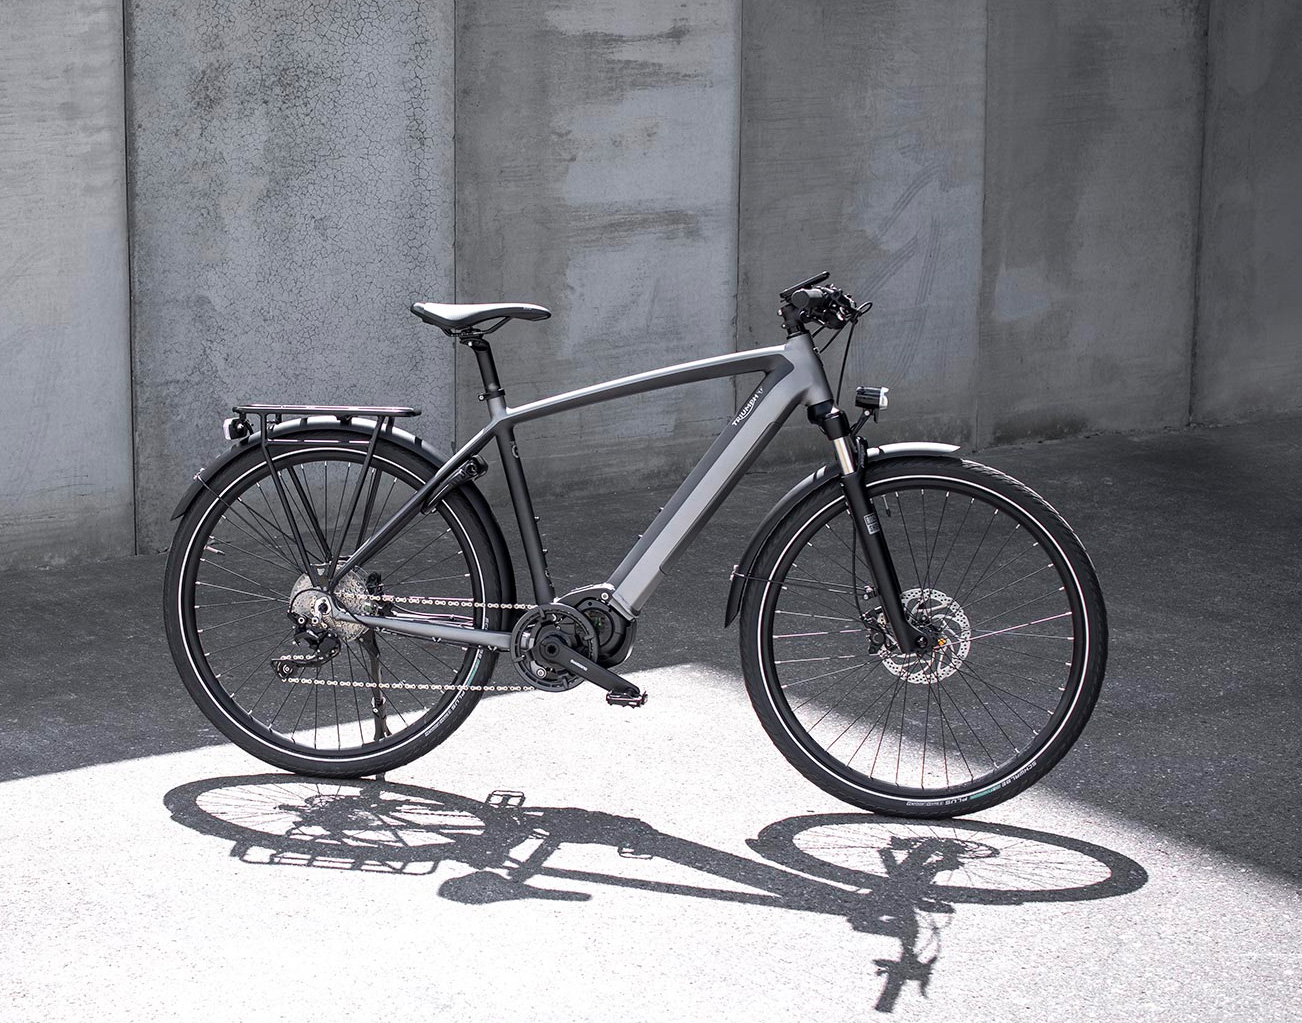 Triumph Introduces The Trekker, Its First-Ever E-Bike at werd.com